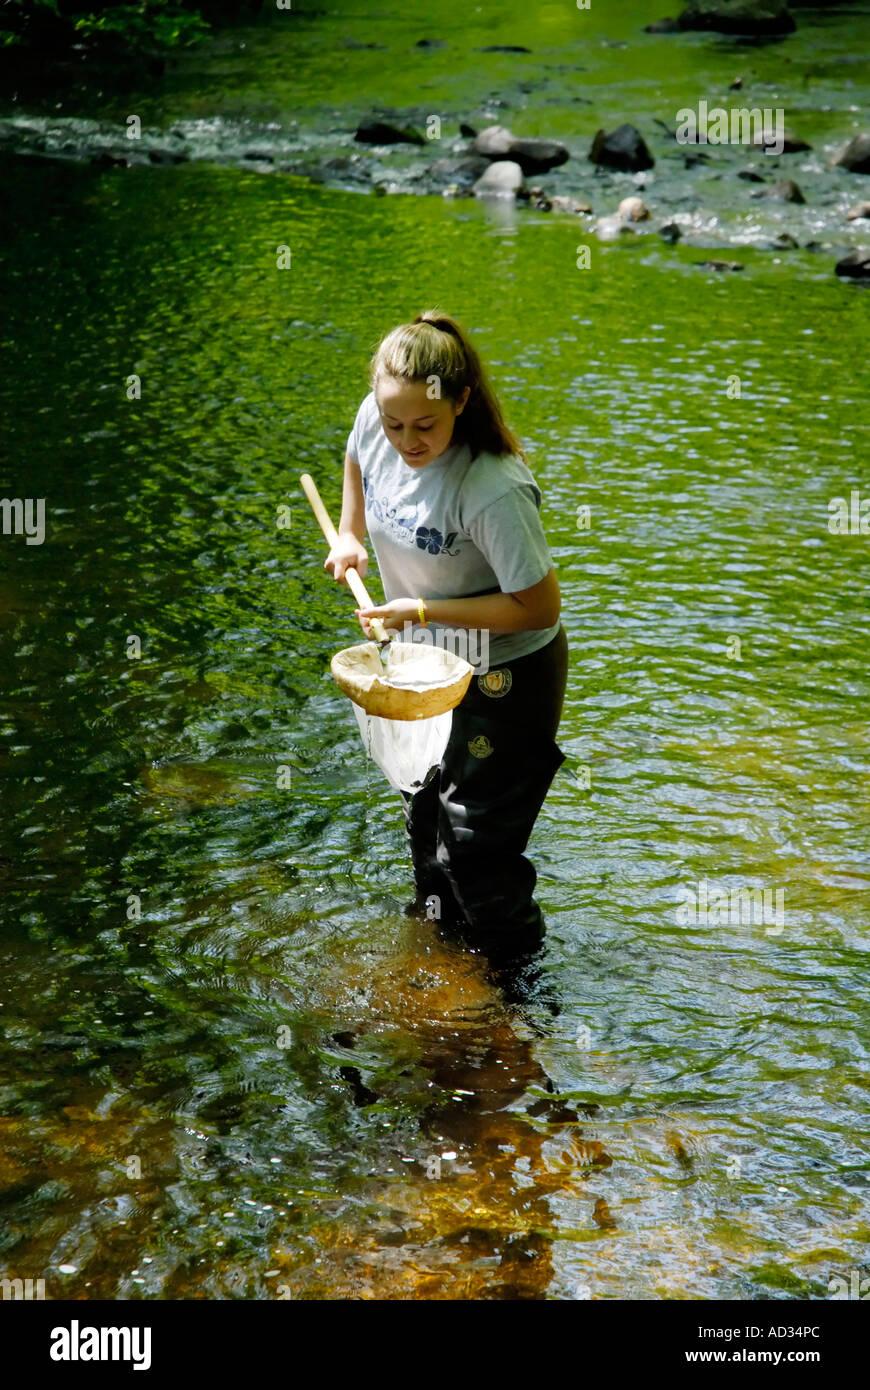 Teenage girl using net sampling river water for fish and